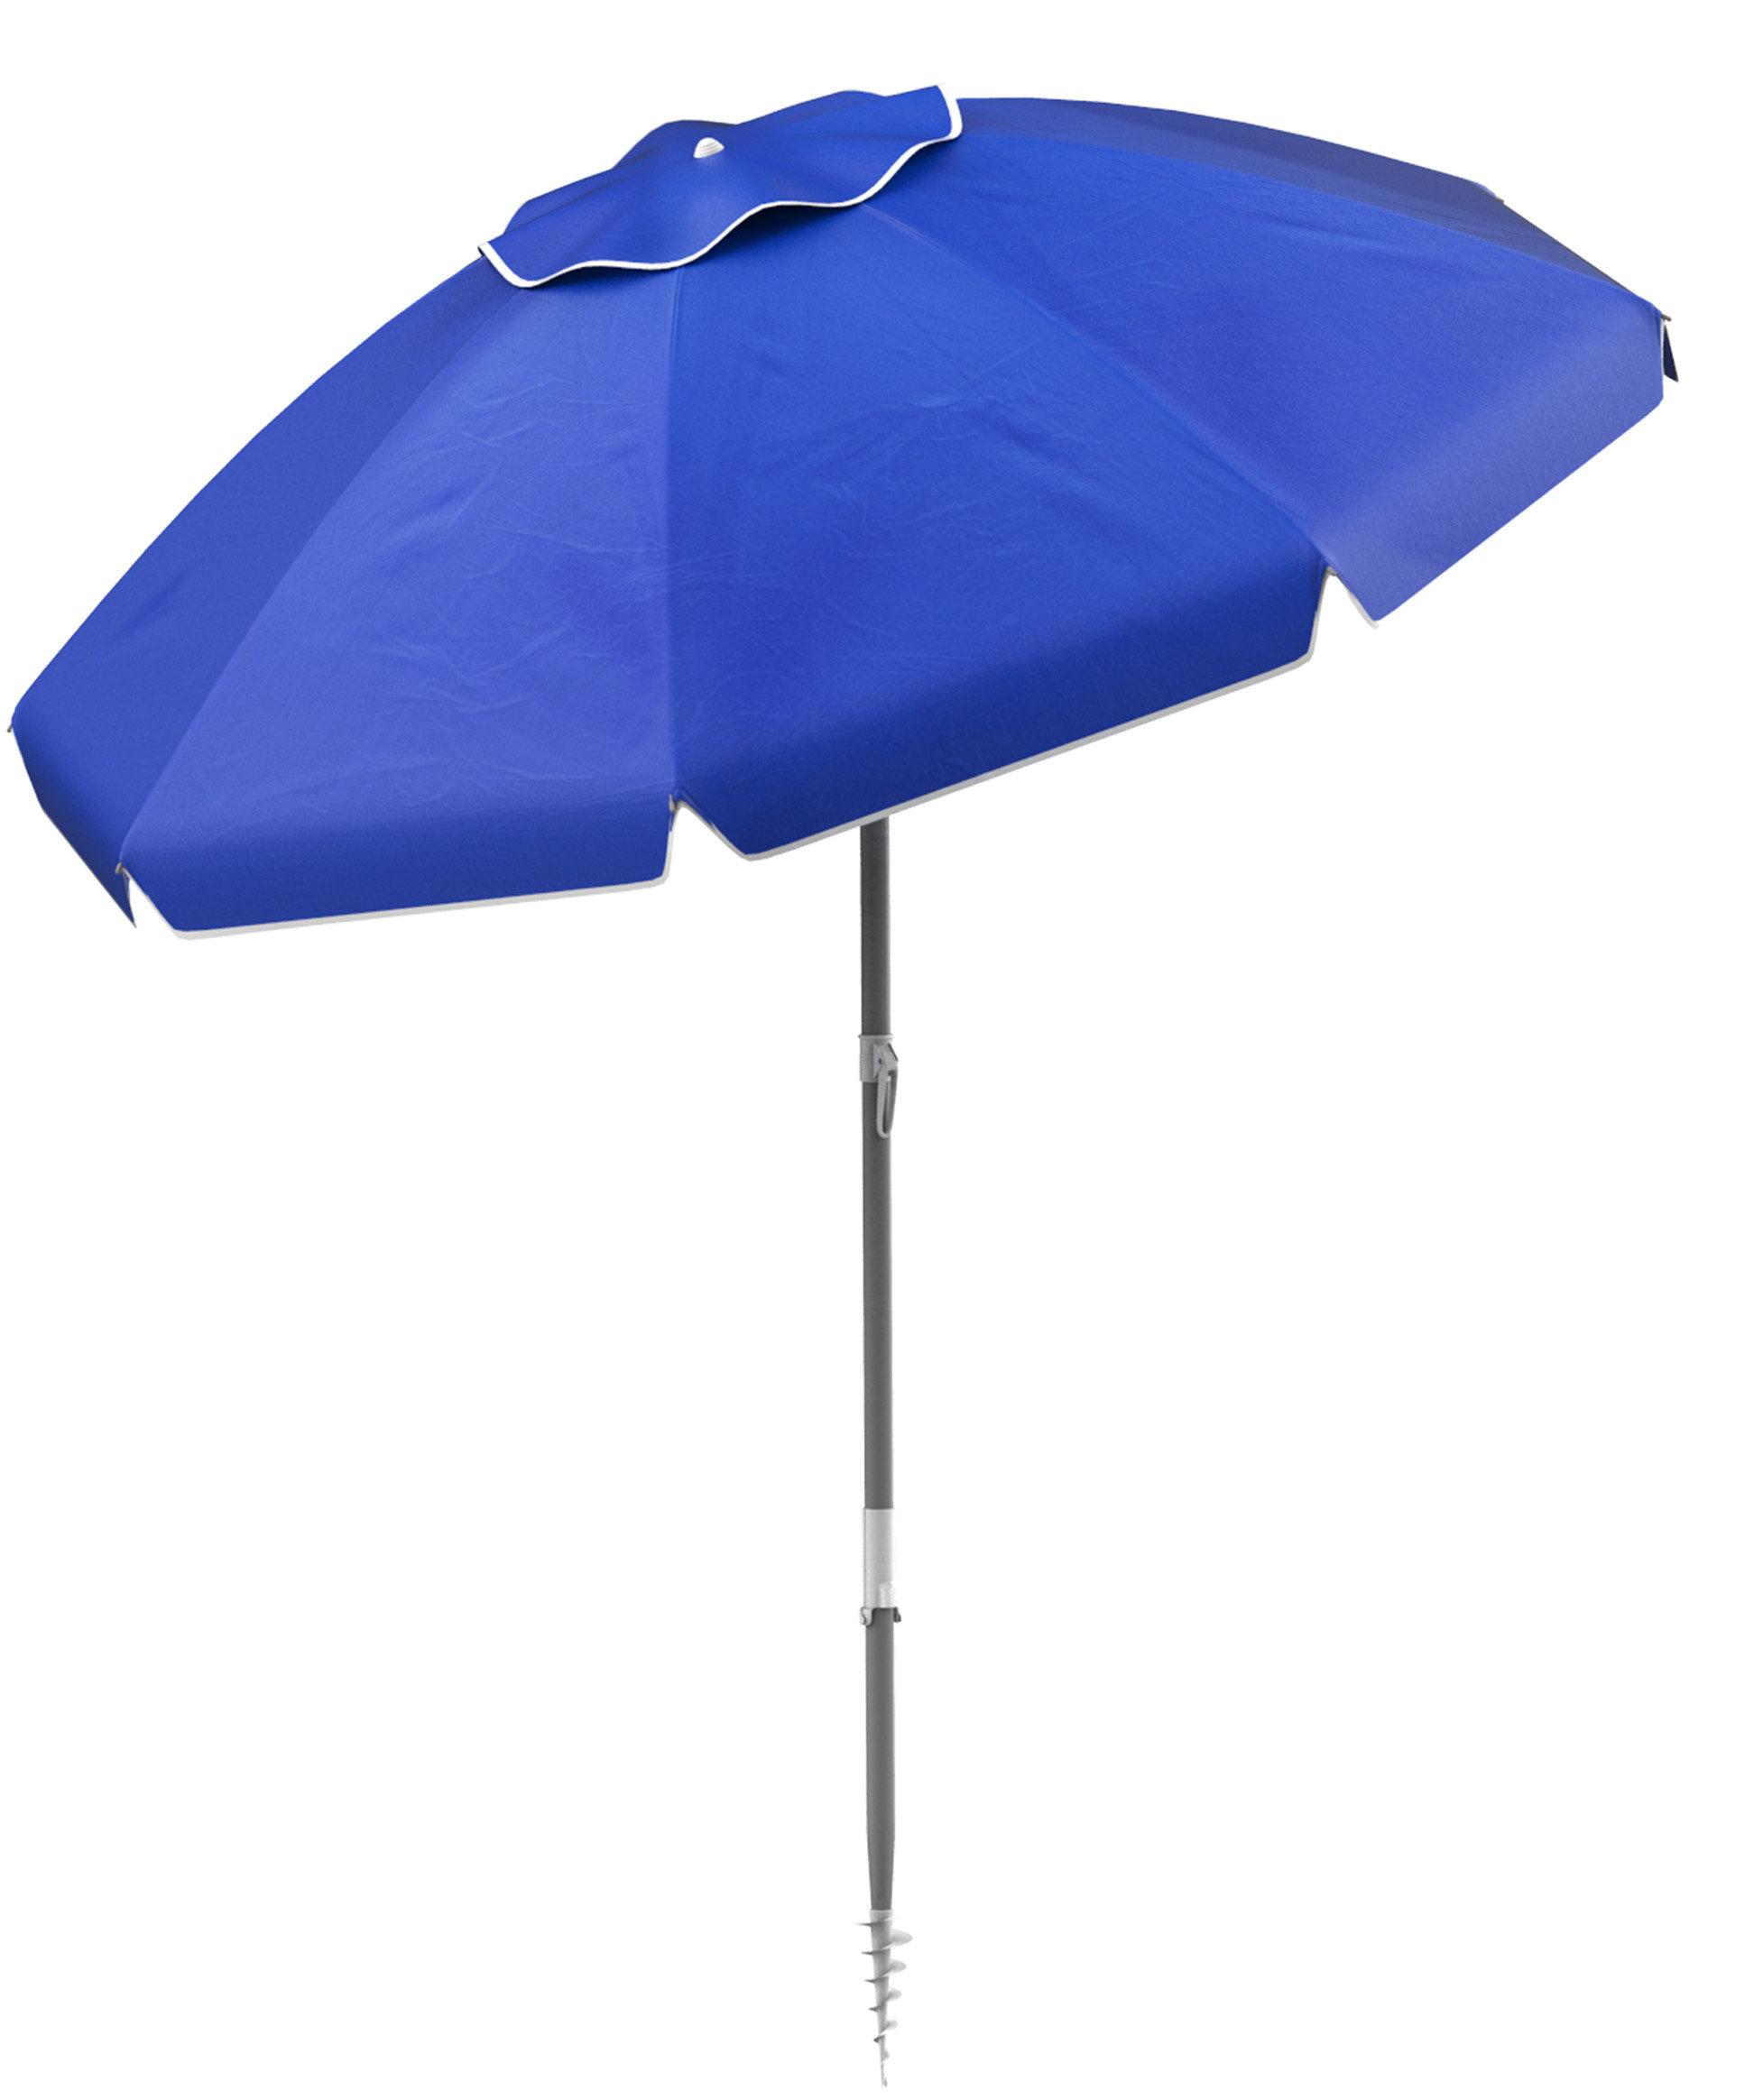 Alondra Ultimate Wondershade 5Beach Umbrellas Throughout Most Current Stanhope Tilting Beach Umbrella (View 5 of 20)